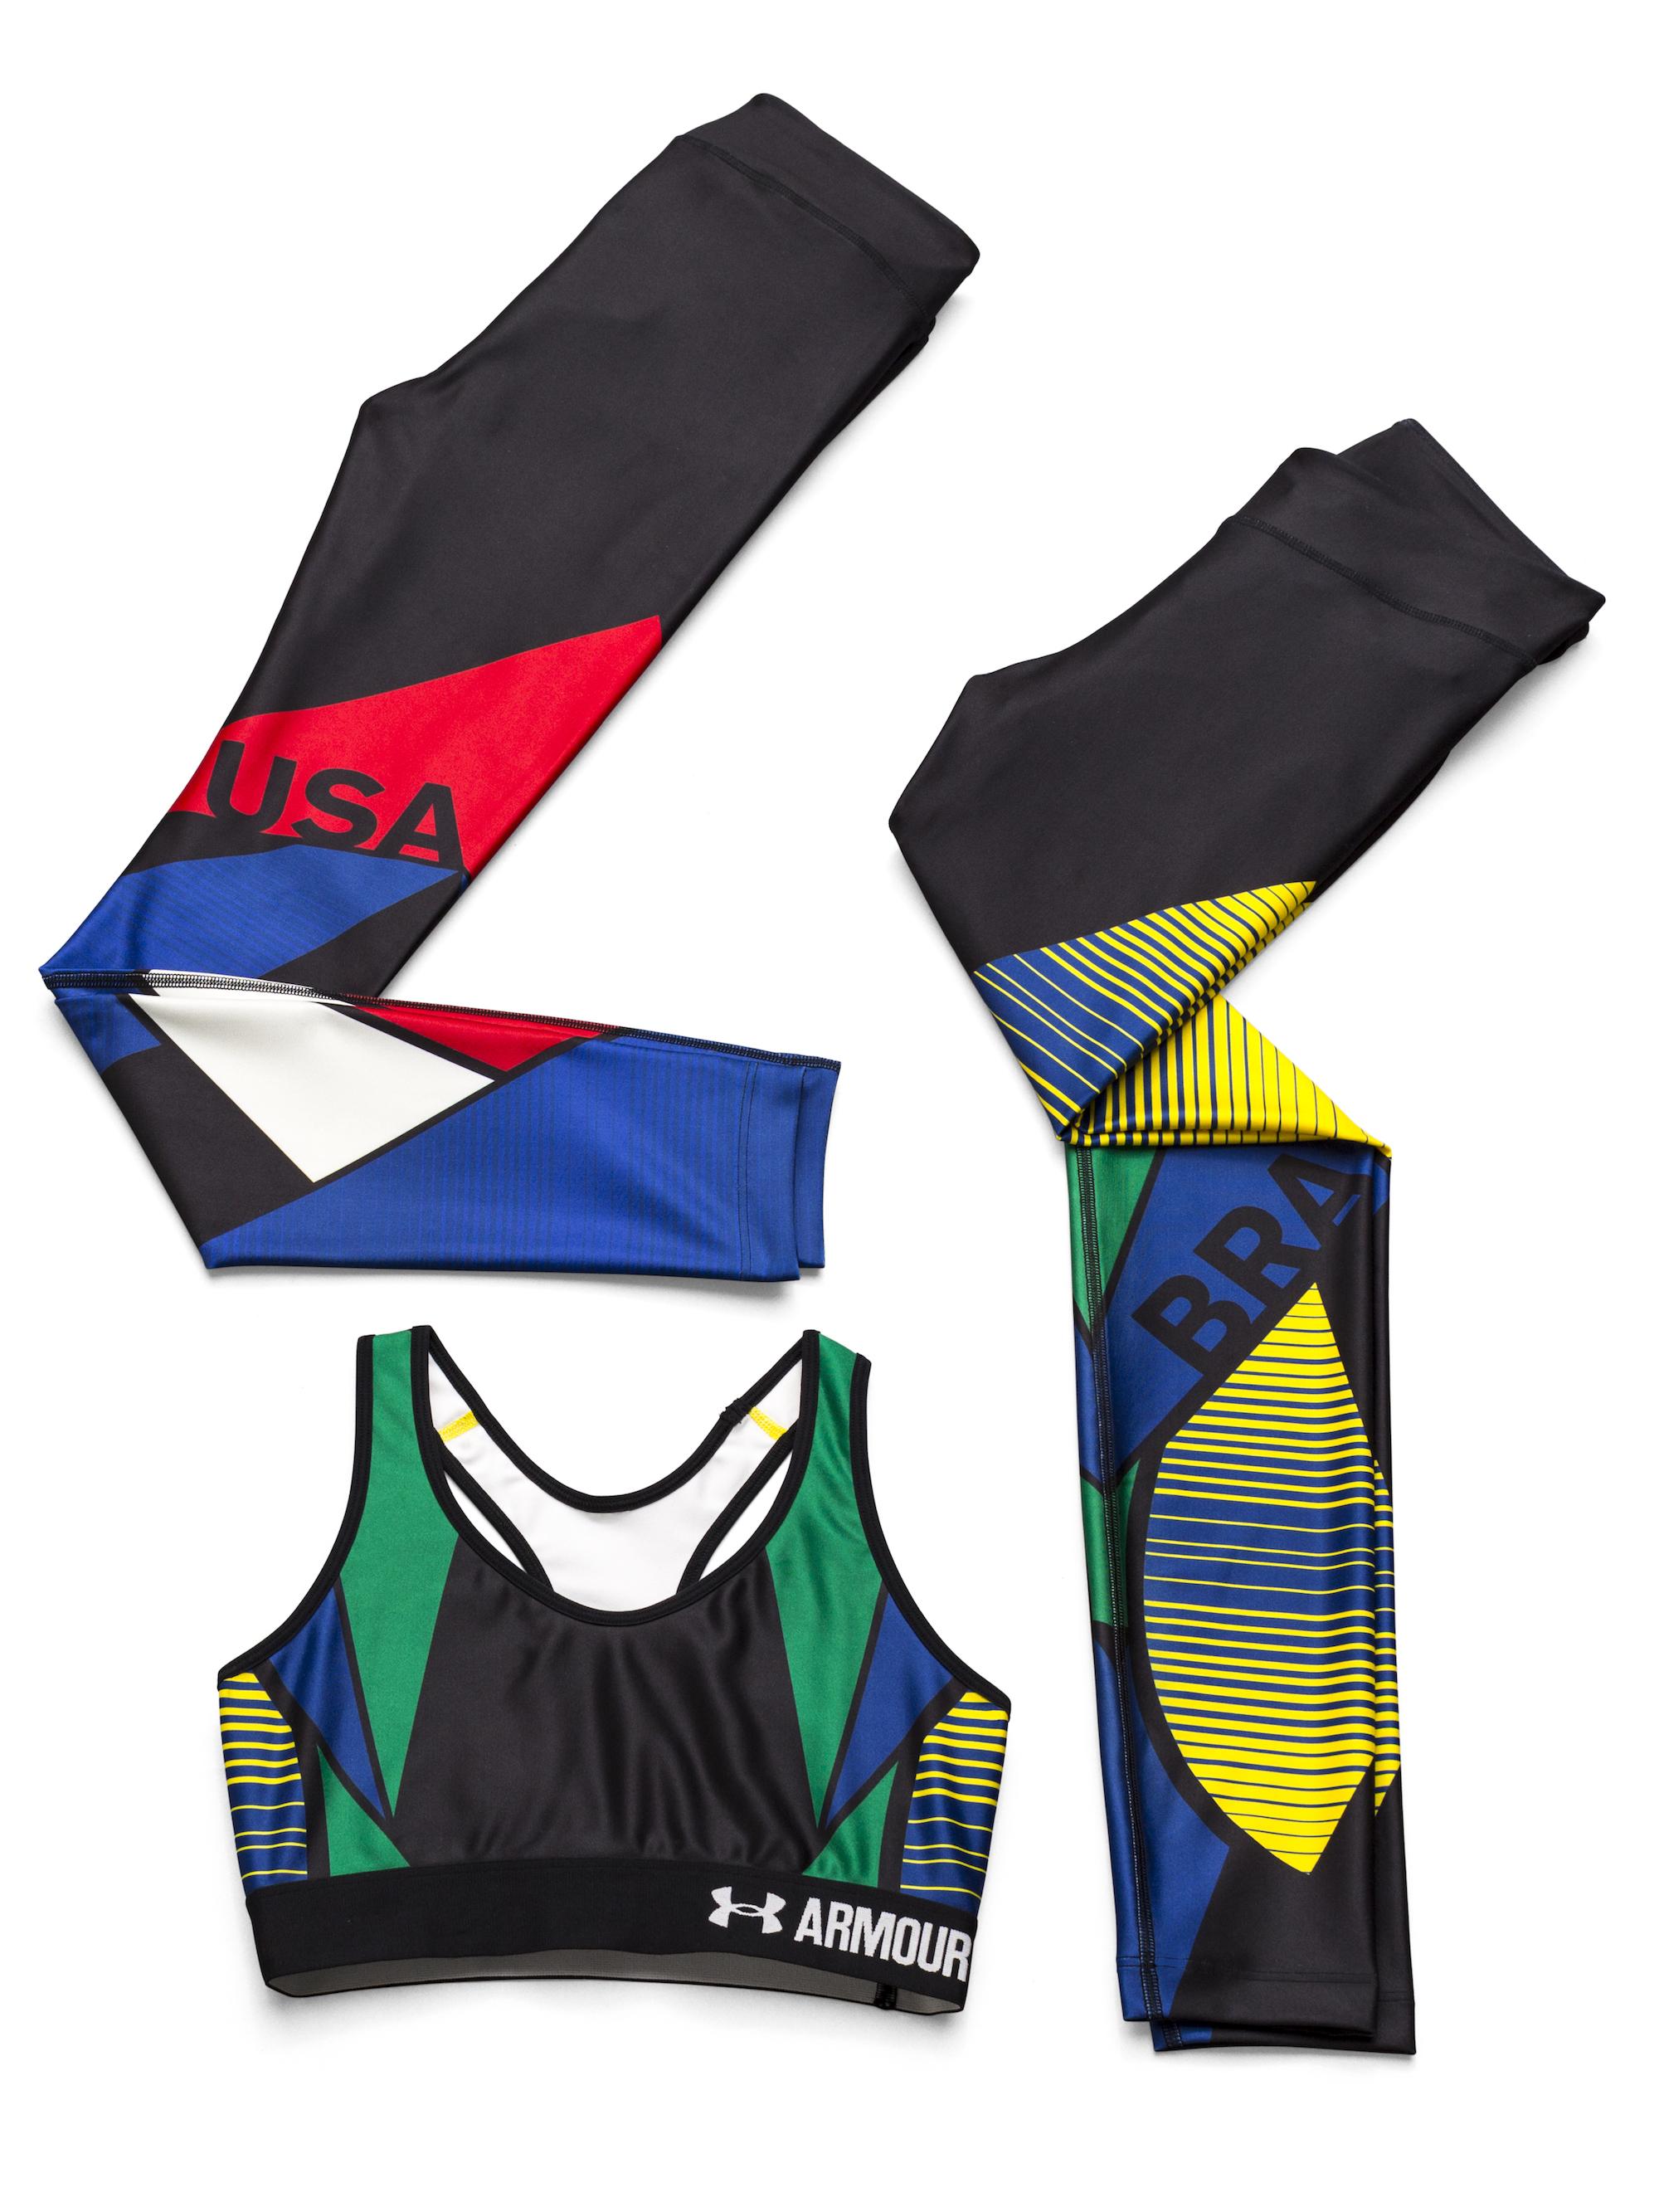 UA World collection 76